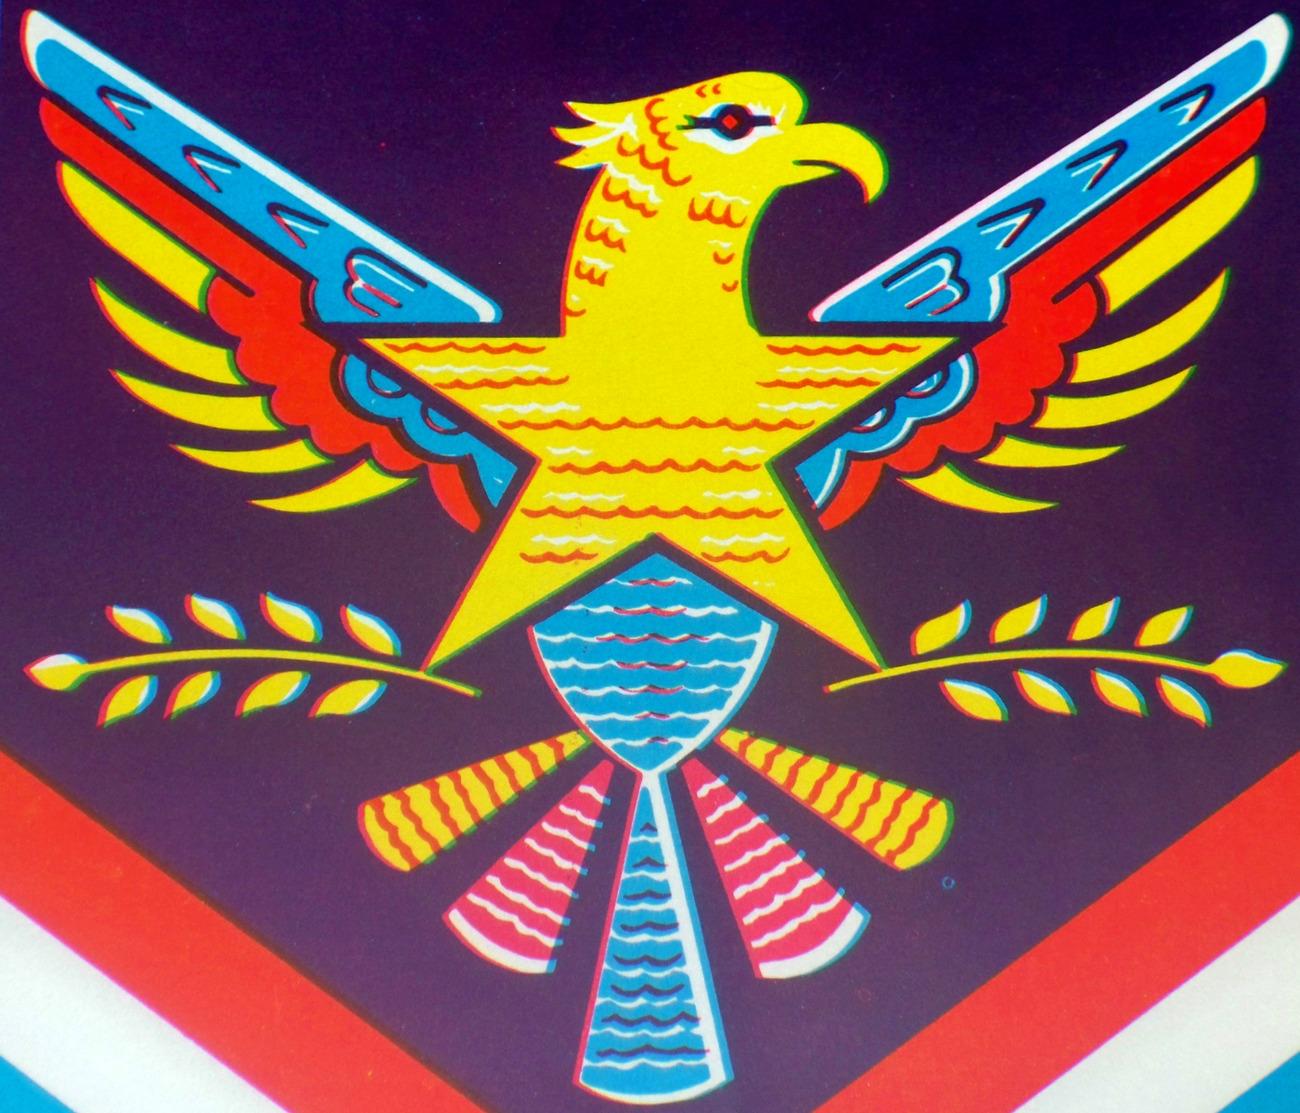 American eagle broom label 002